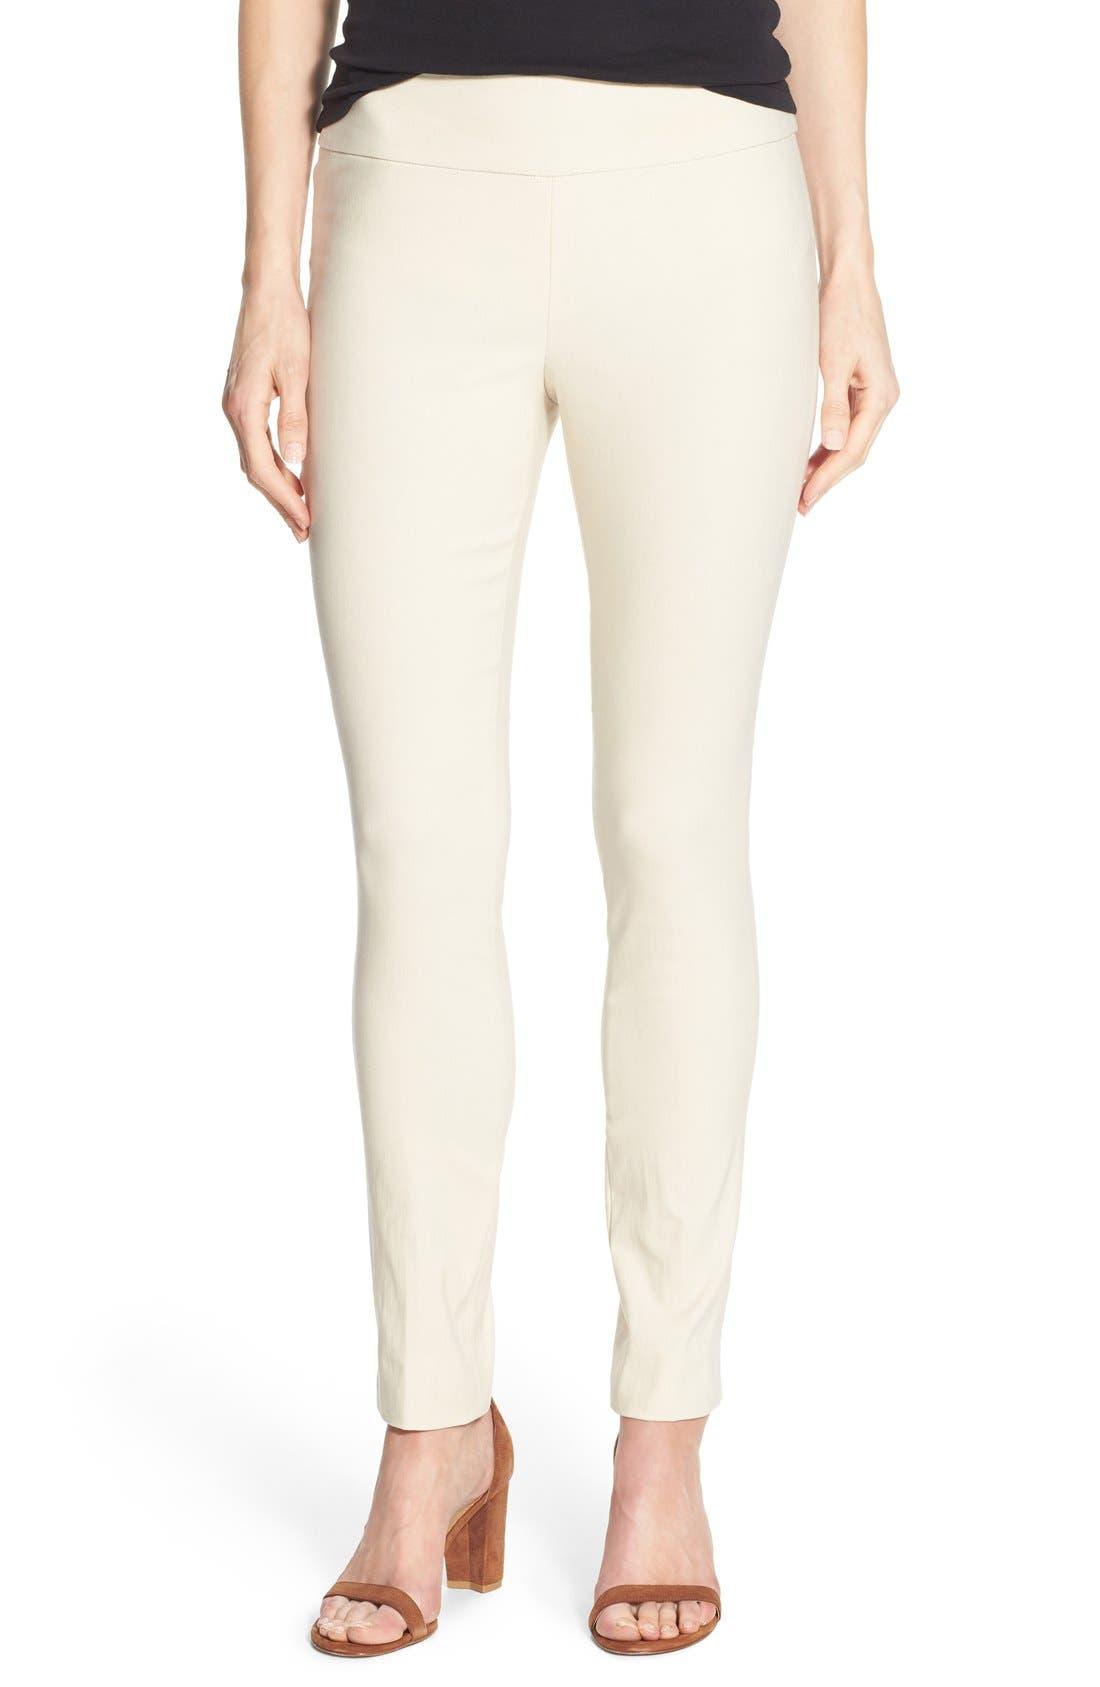 Main Image - NIC+ZOE 'The Wonder Stretch' Slim Leg Pants (Regular & Petite)